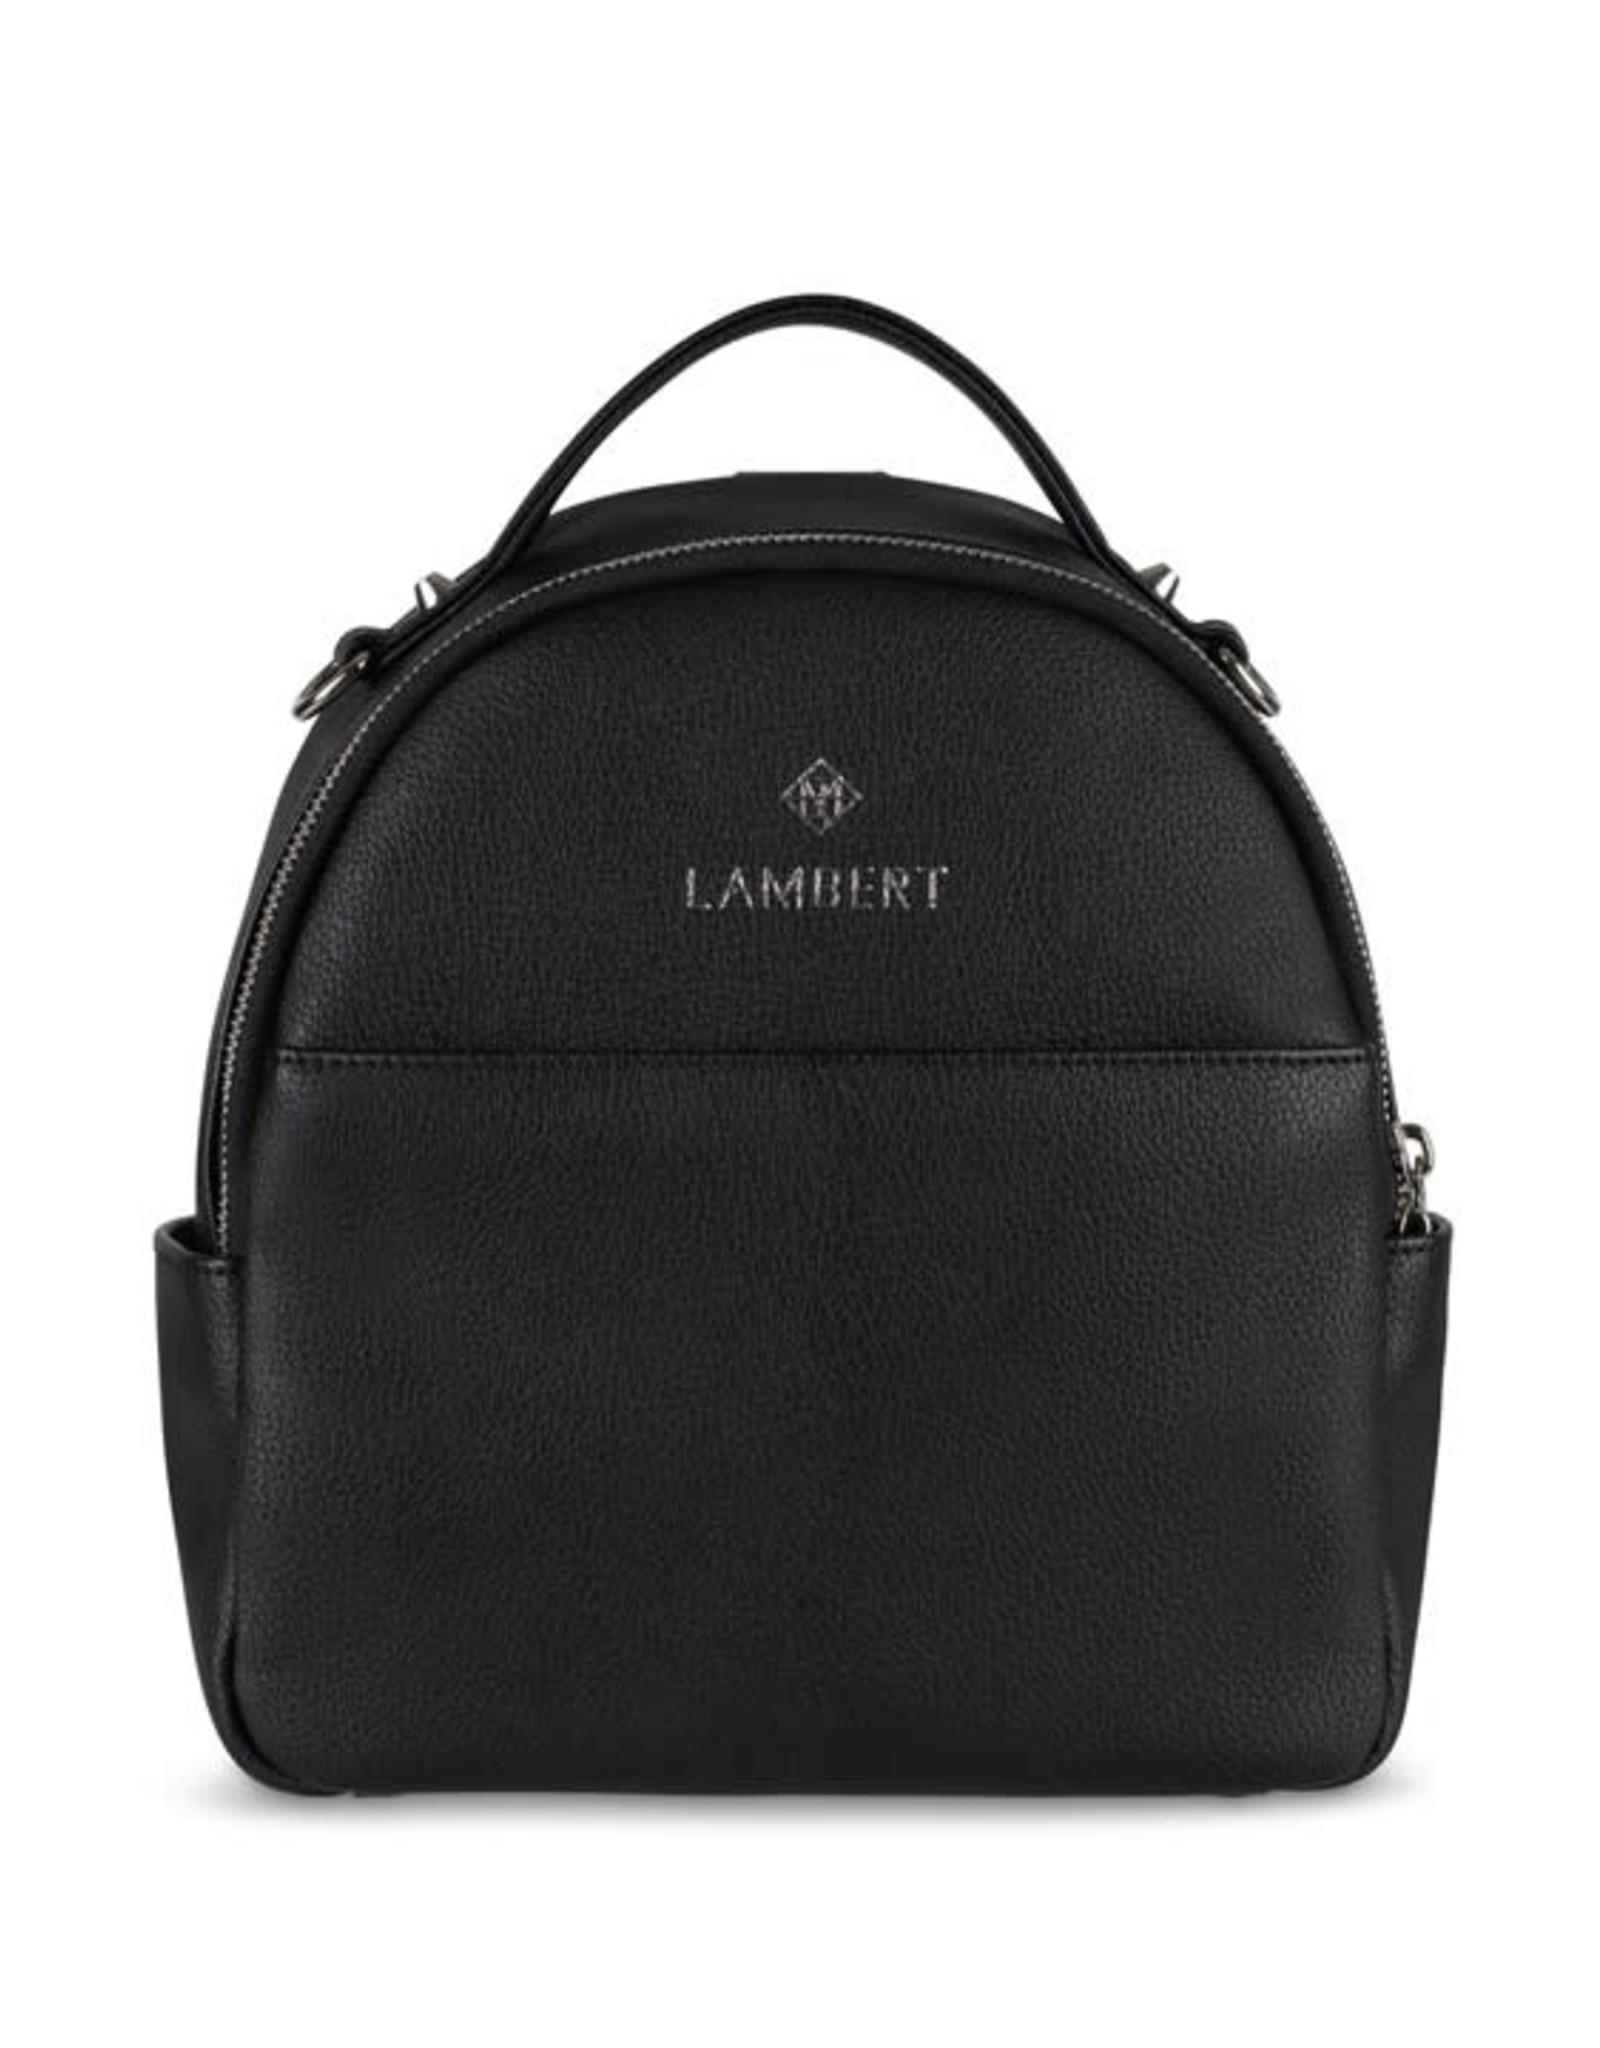 Lambert Charlie Noir